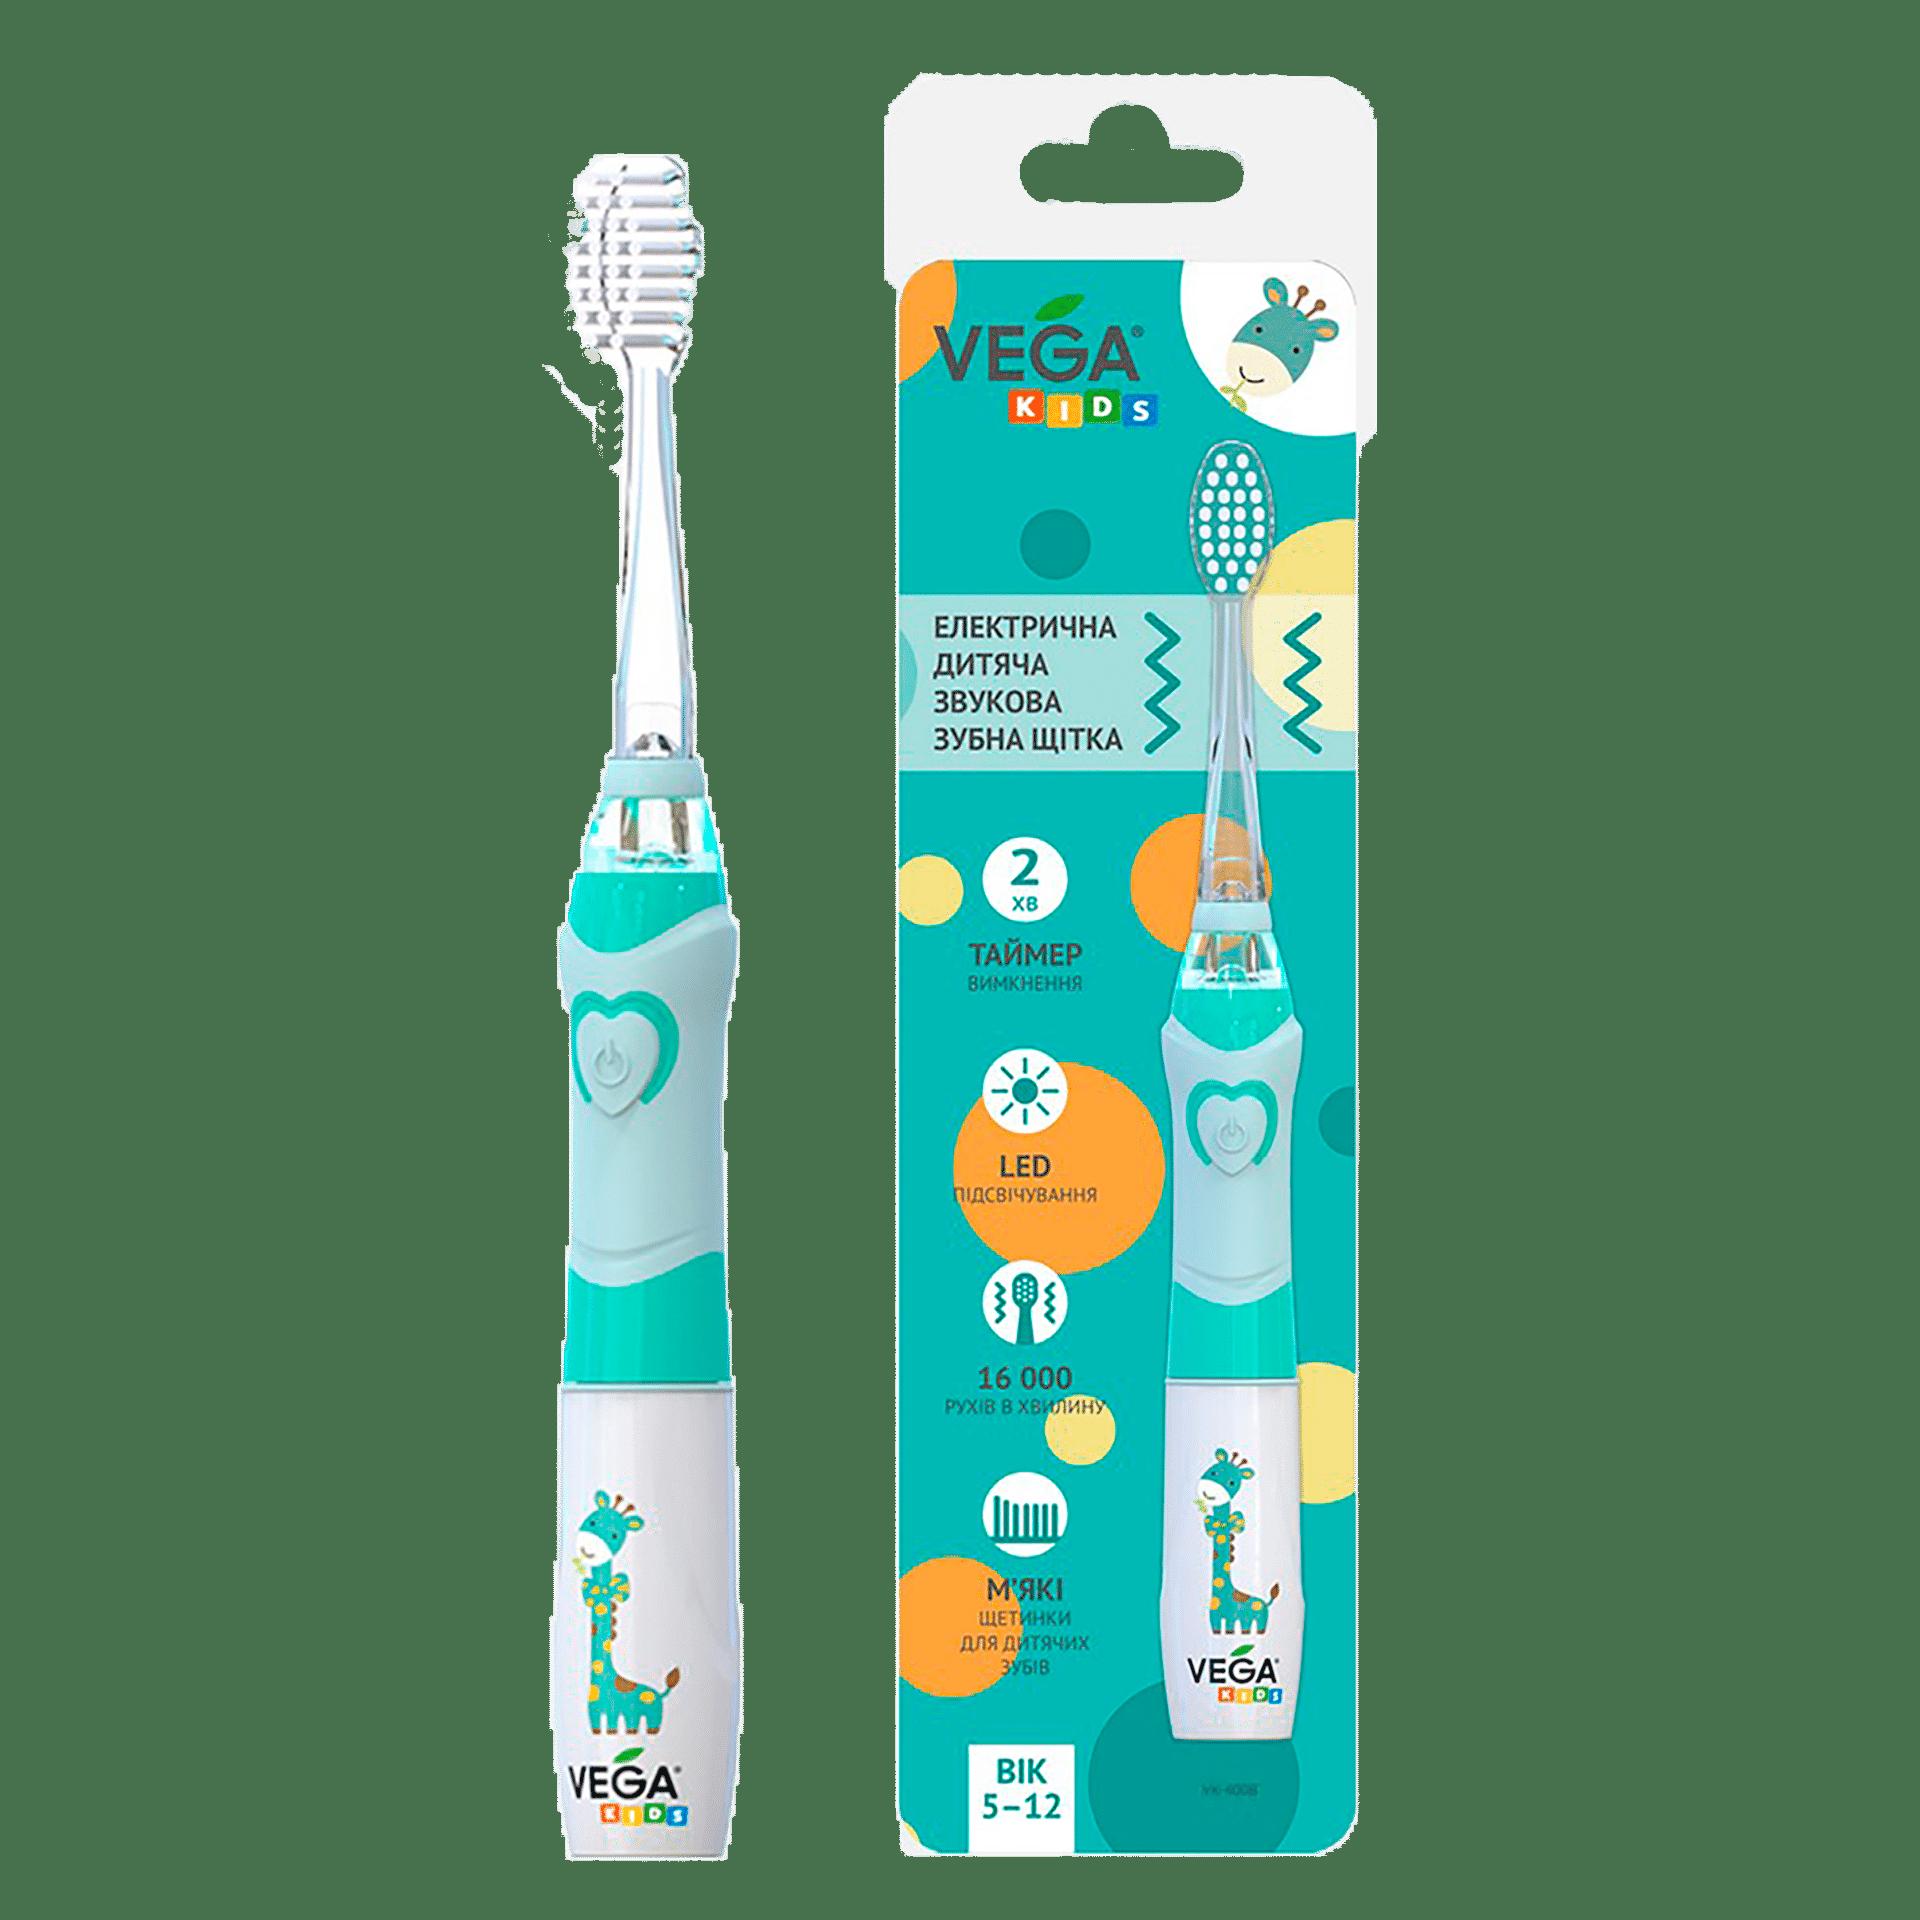 Електрична дитяча звукова зубна щітка Vega Kids VK-400B LIGHT-UP (блакитна)